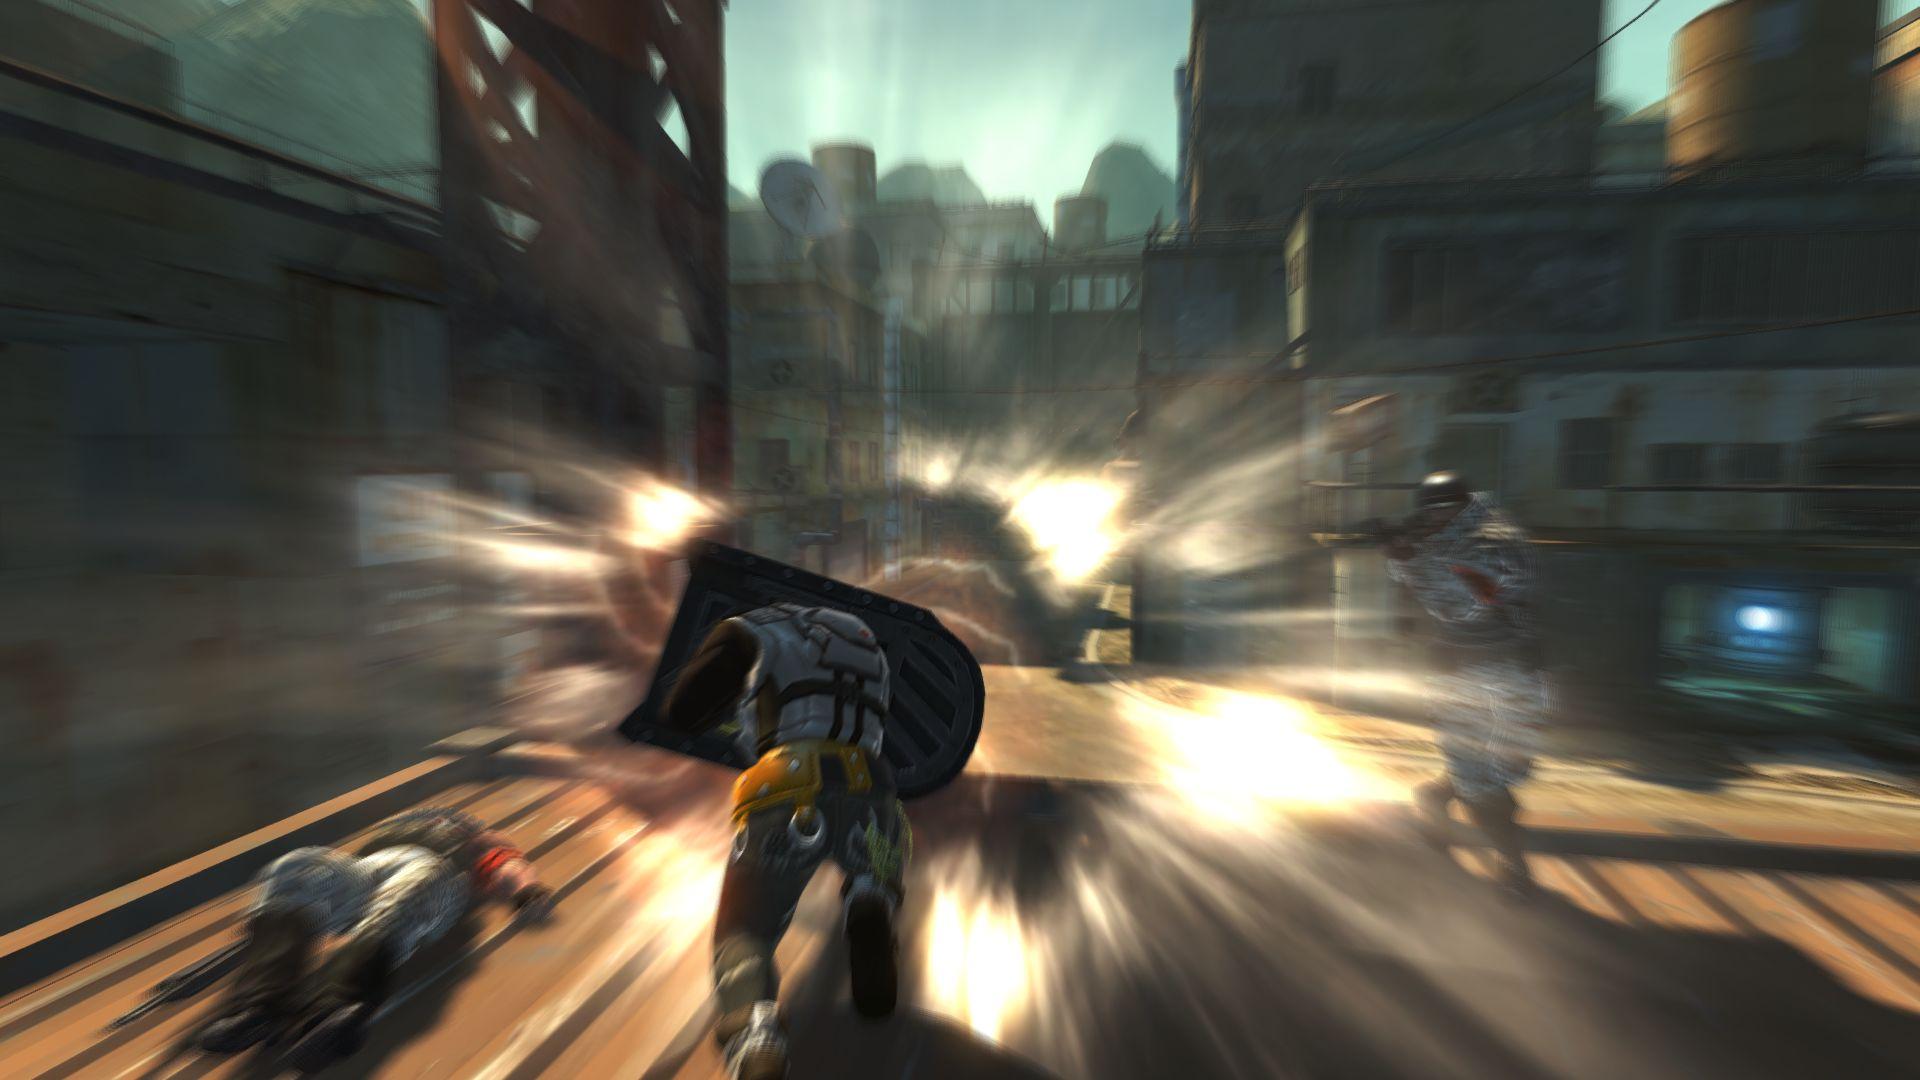 3D Monster Truck: Skyroads - Free online games at ...